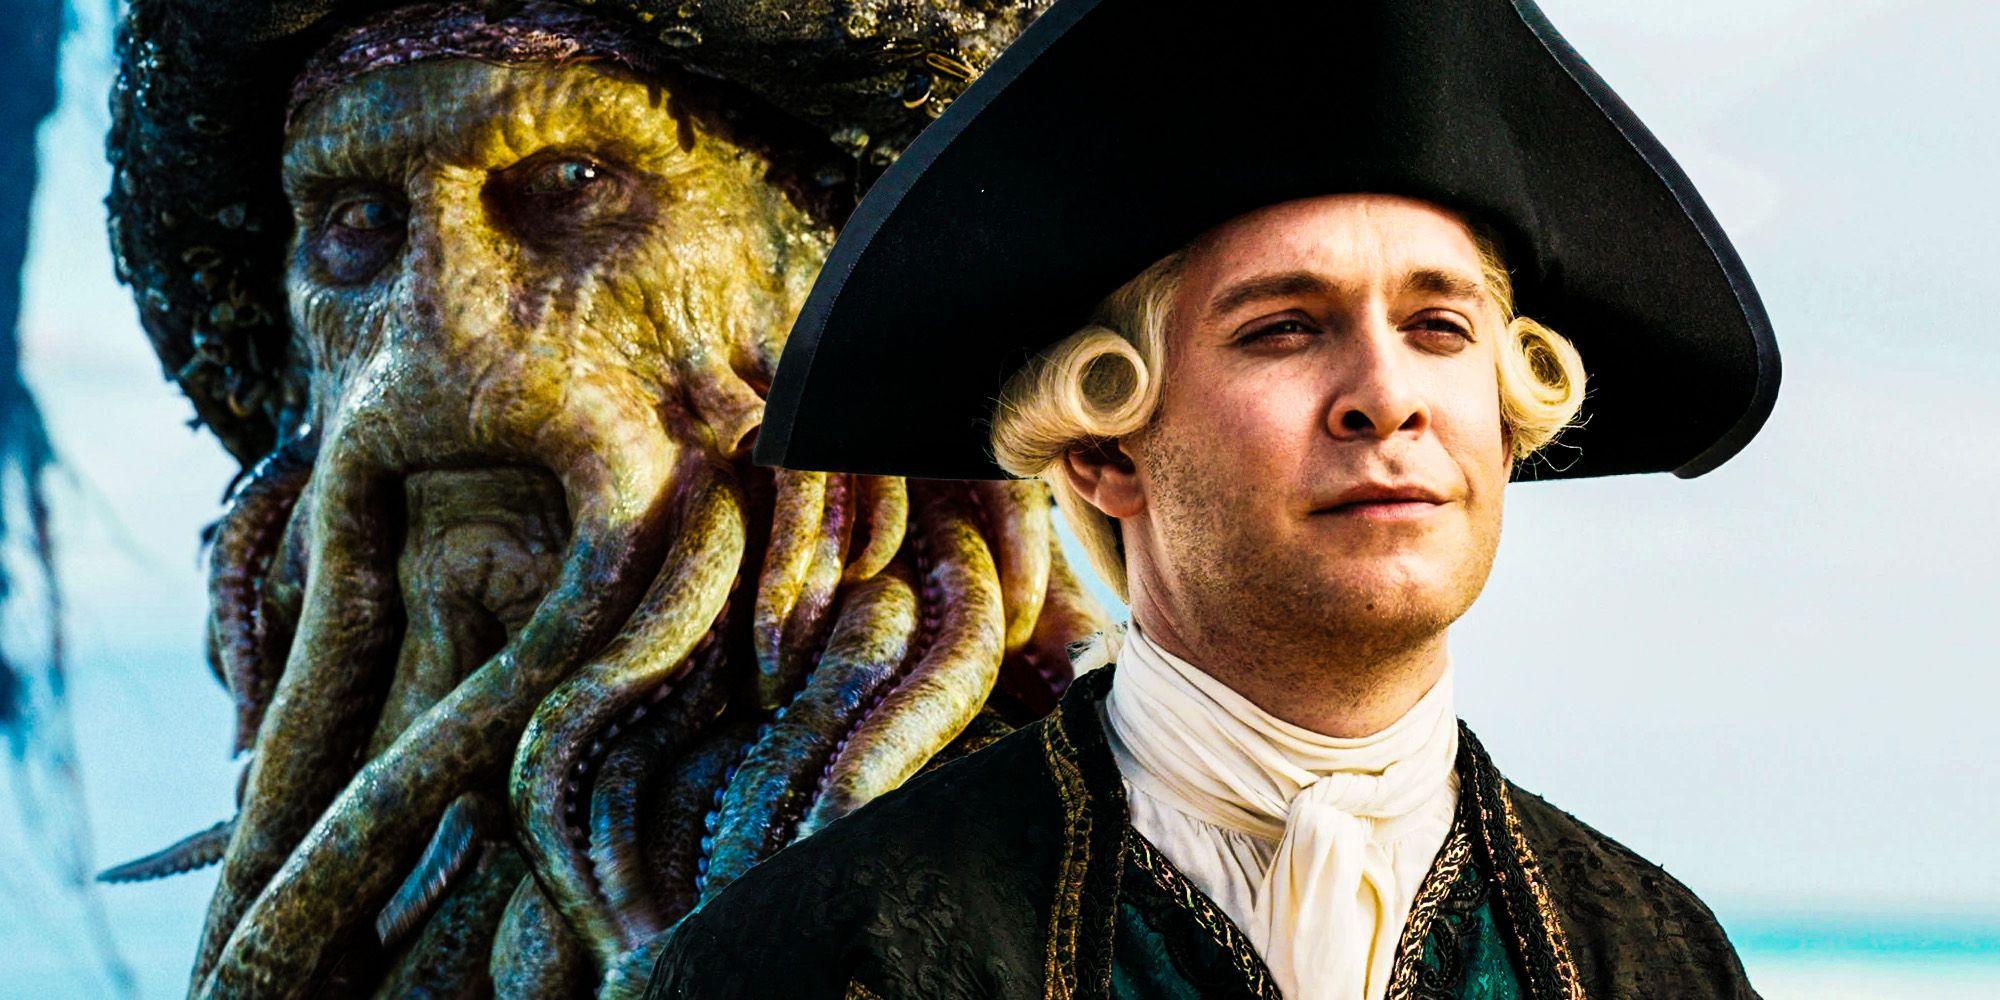 POTC: Why Cutler Beckett Left Davy Jones' Heart On The Flying Dutchman